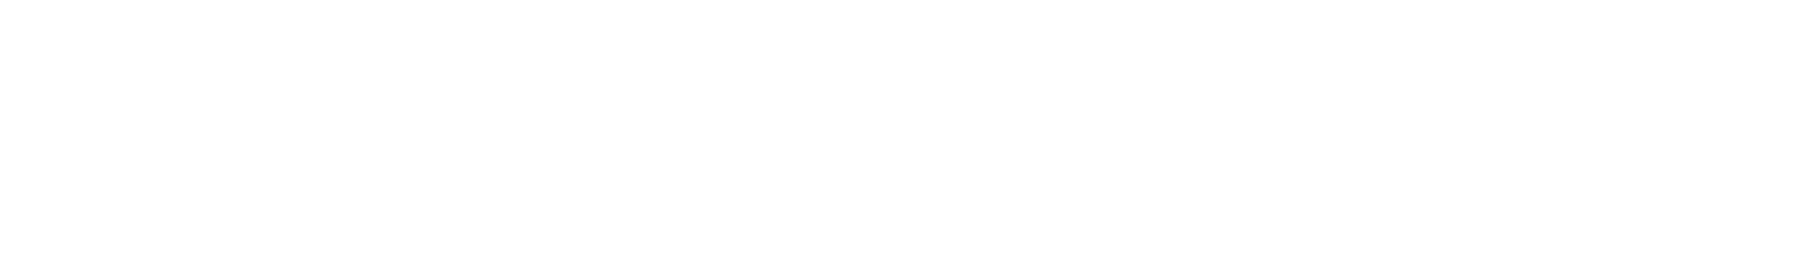 vedh melodyloop 016 am fmaj7 c gsus4 120bpm